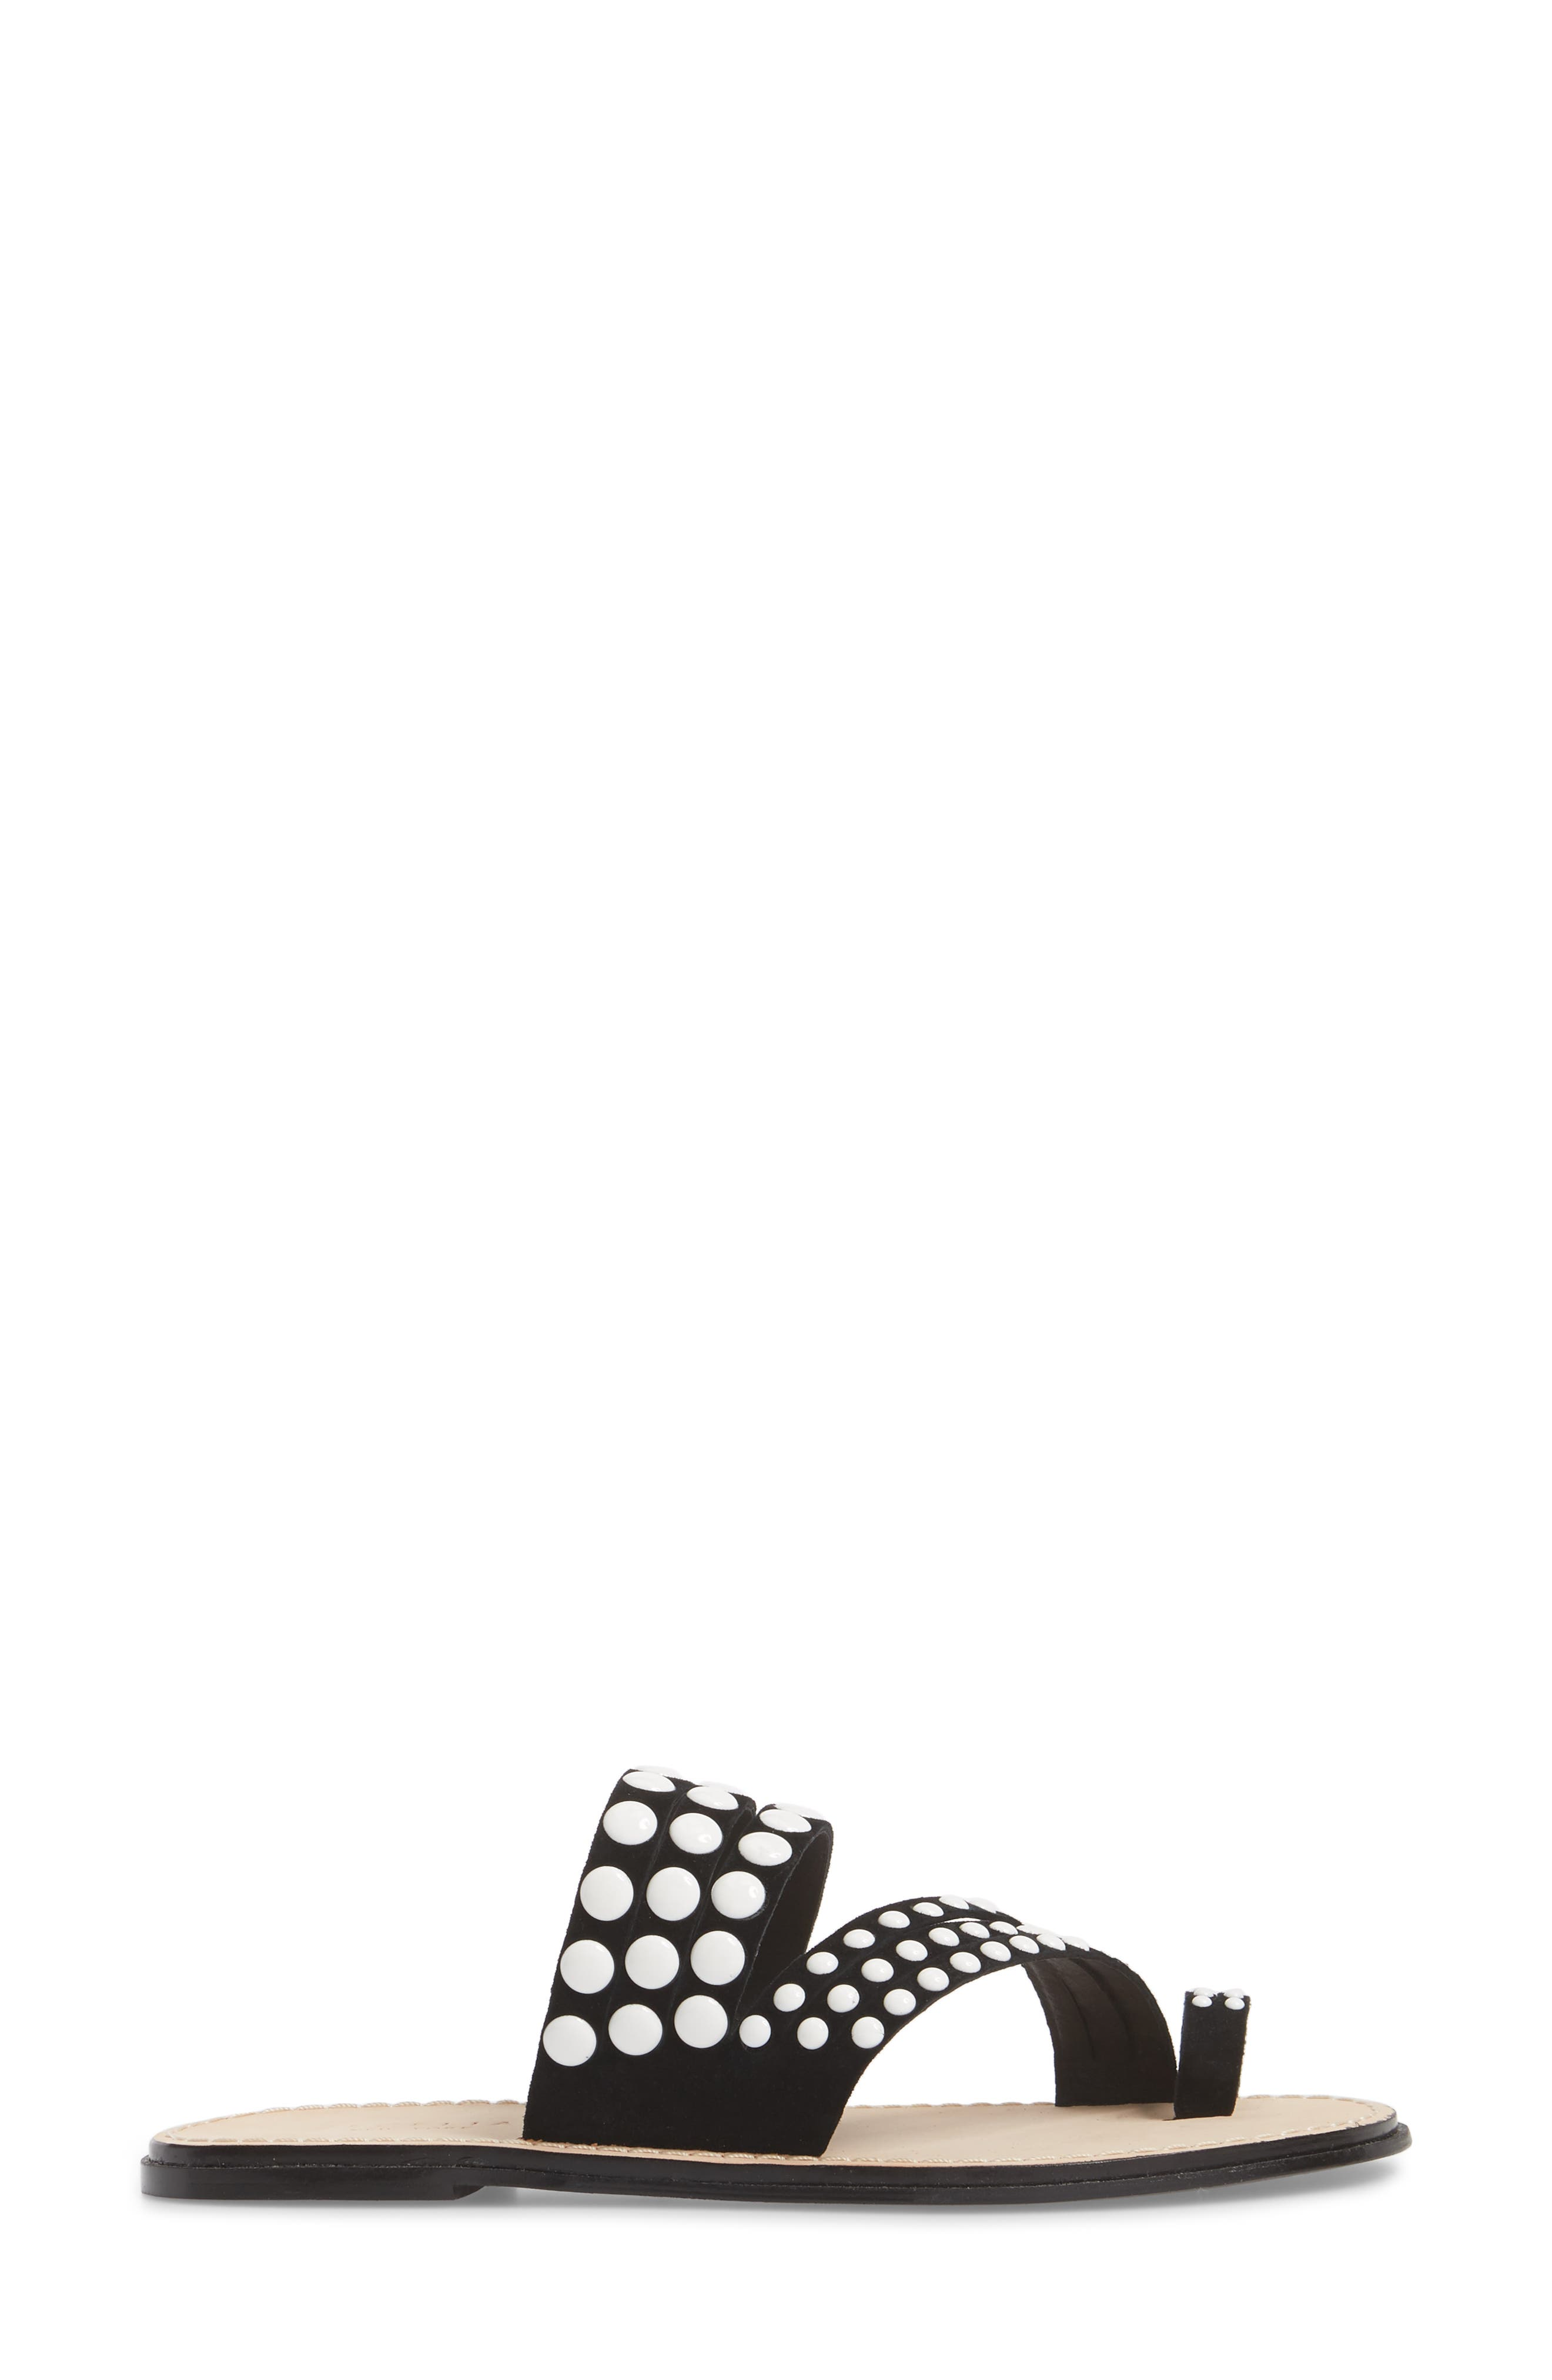 Pezz Studded Sandal,                             Alternate thumbnail 3, color,                             001